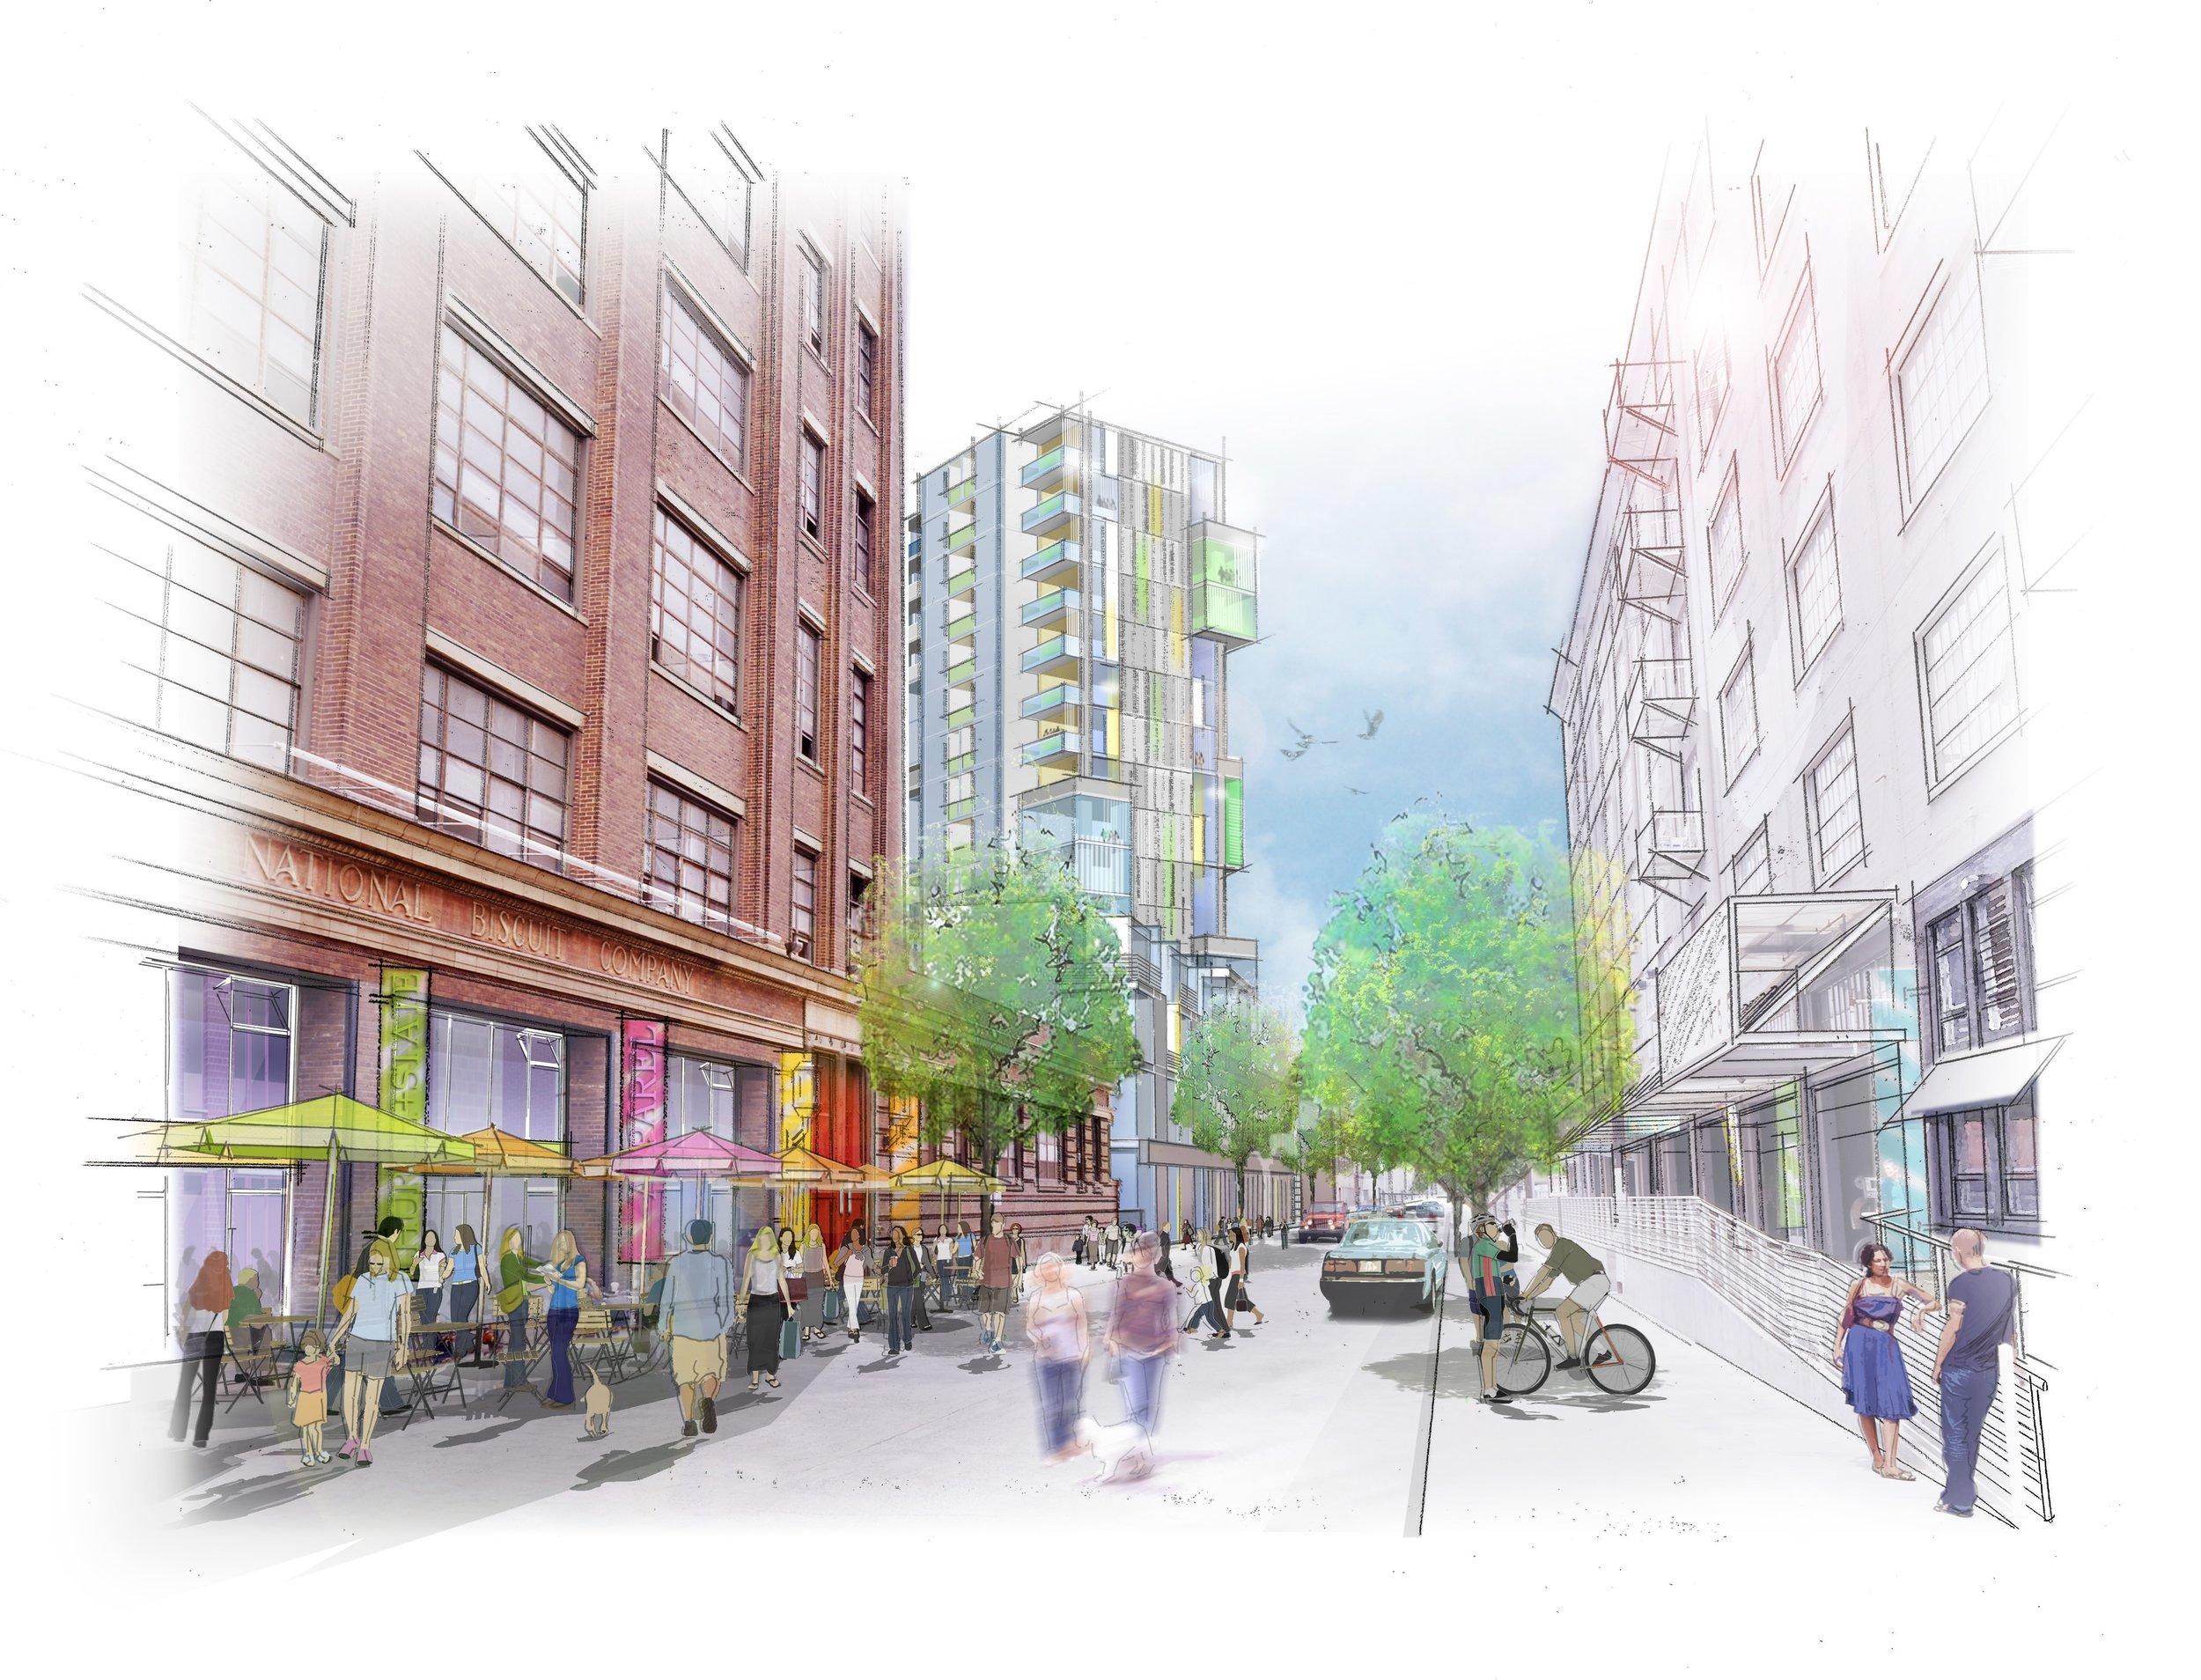 070217_msl rendering streetscape_bala.JPG